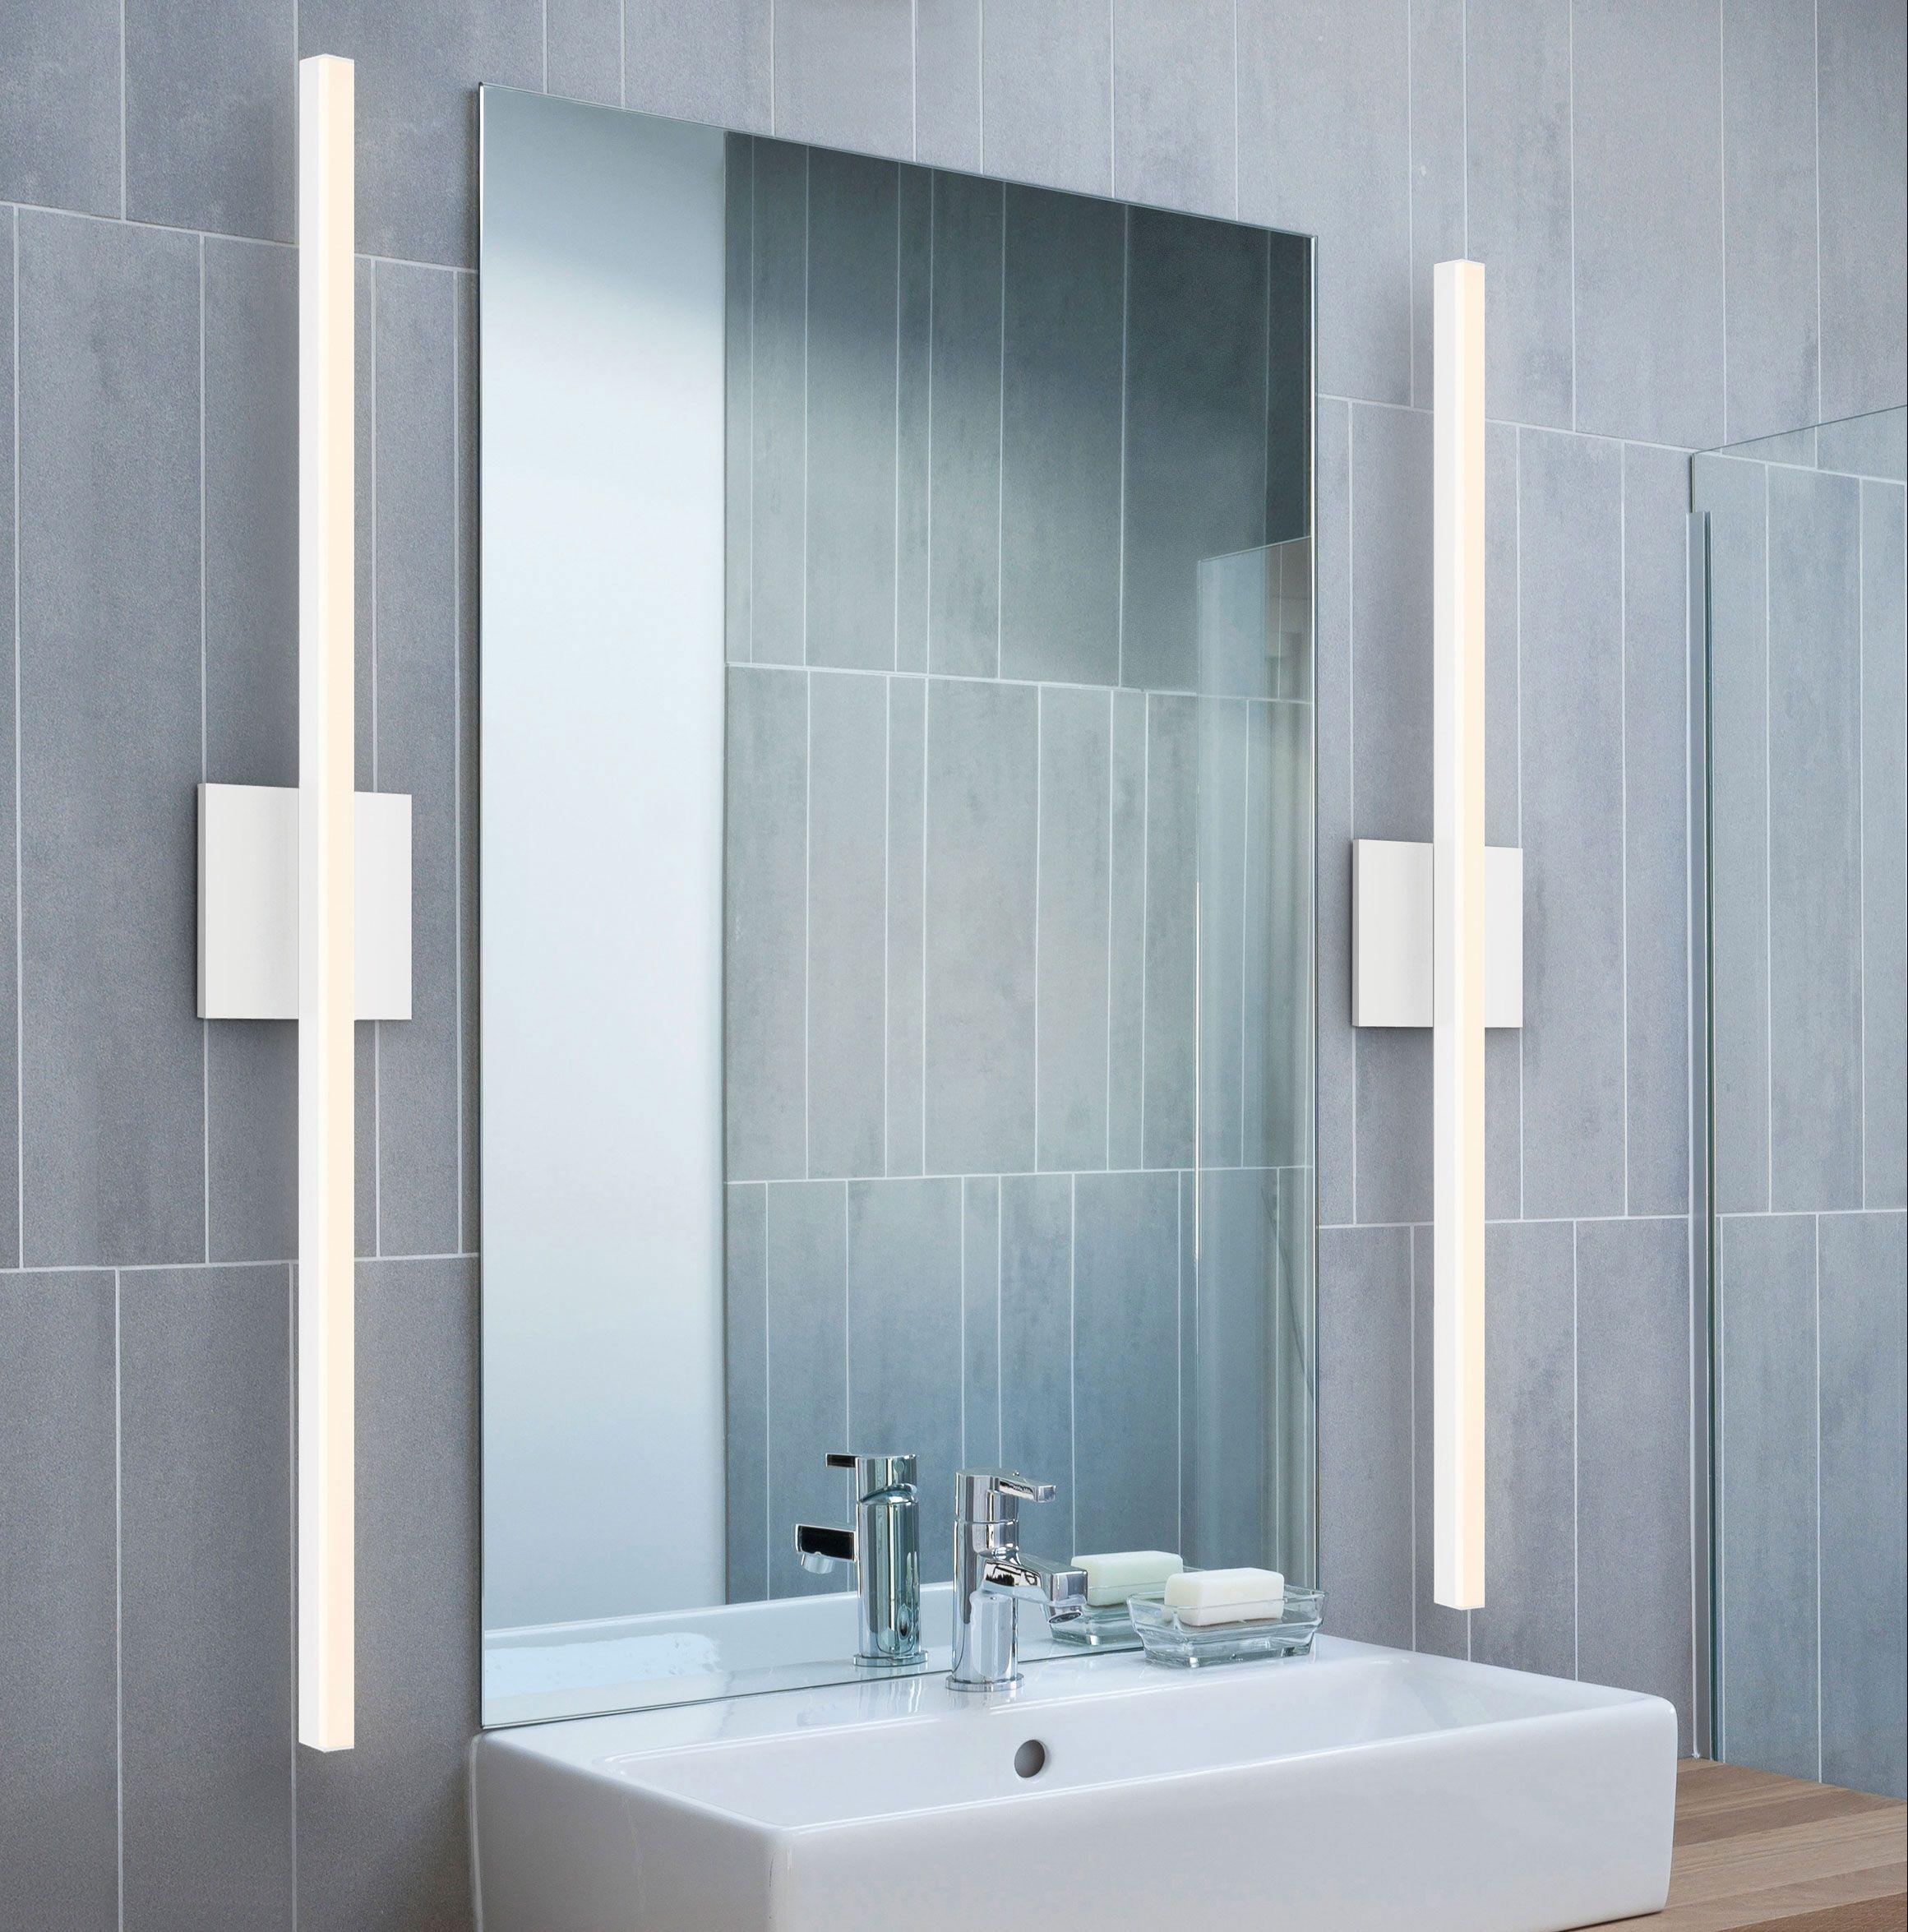 Installation Gallery | Bathroom Lighting | Lighting | Pinterest ...